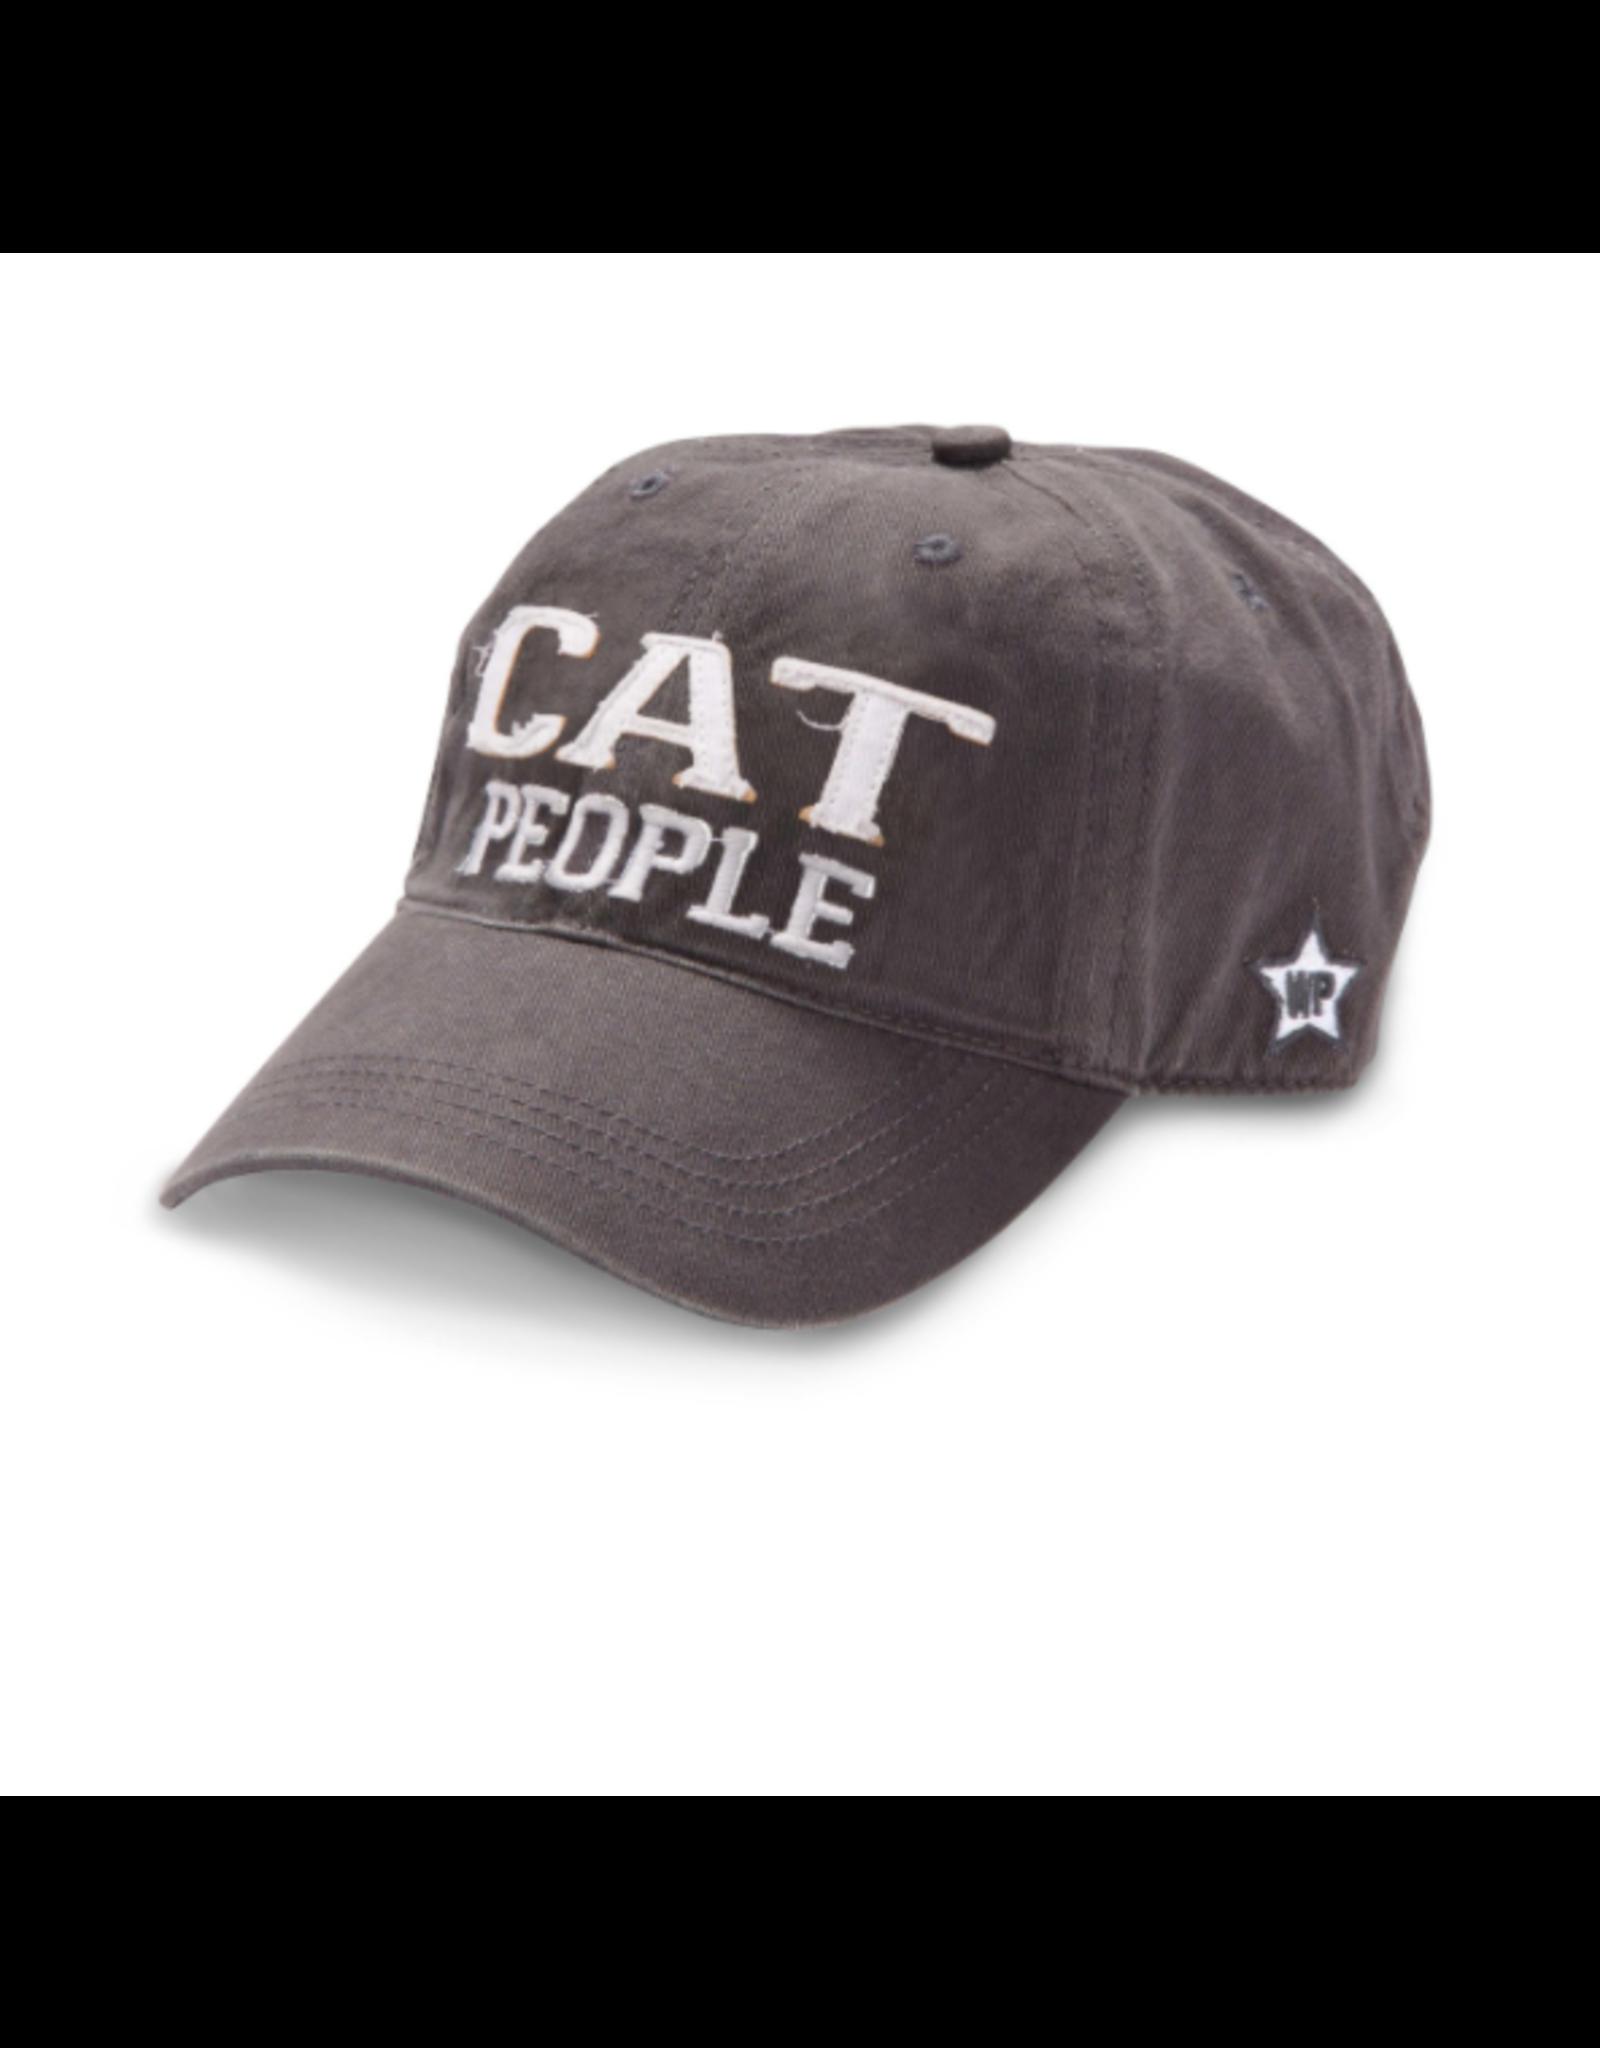 Cat People Ball Hat, grey